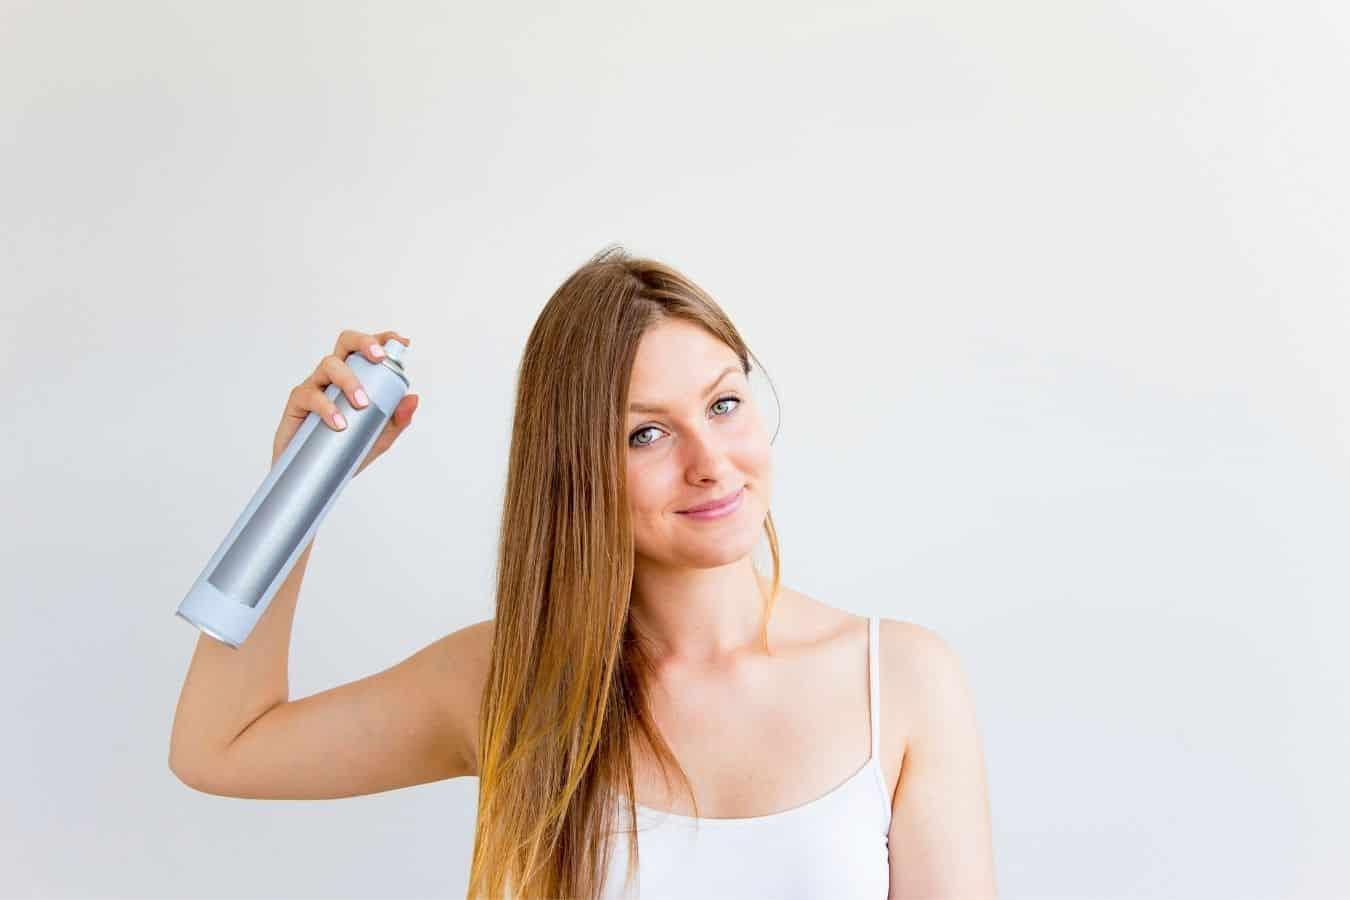 does dry shampoo affect hair dye